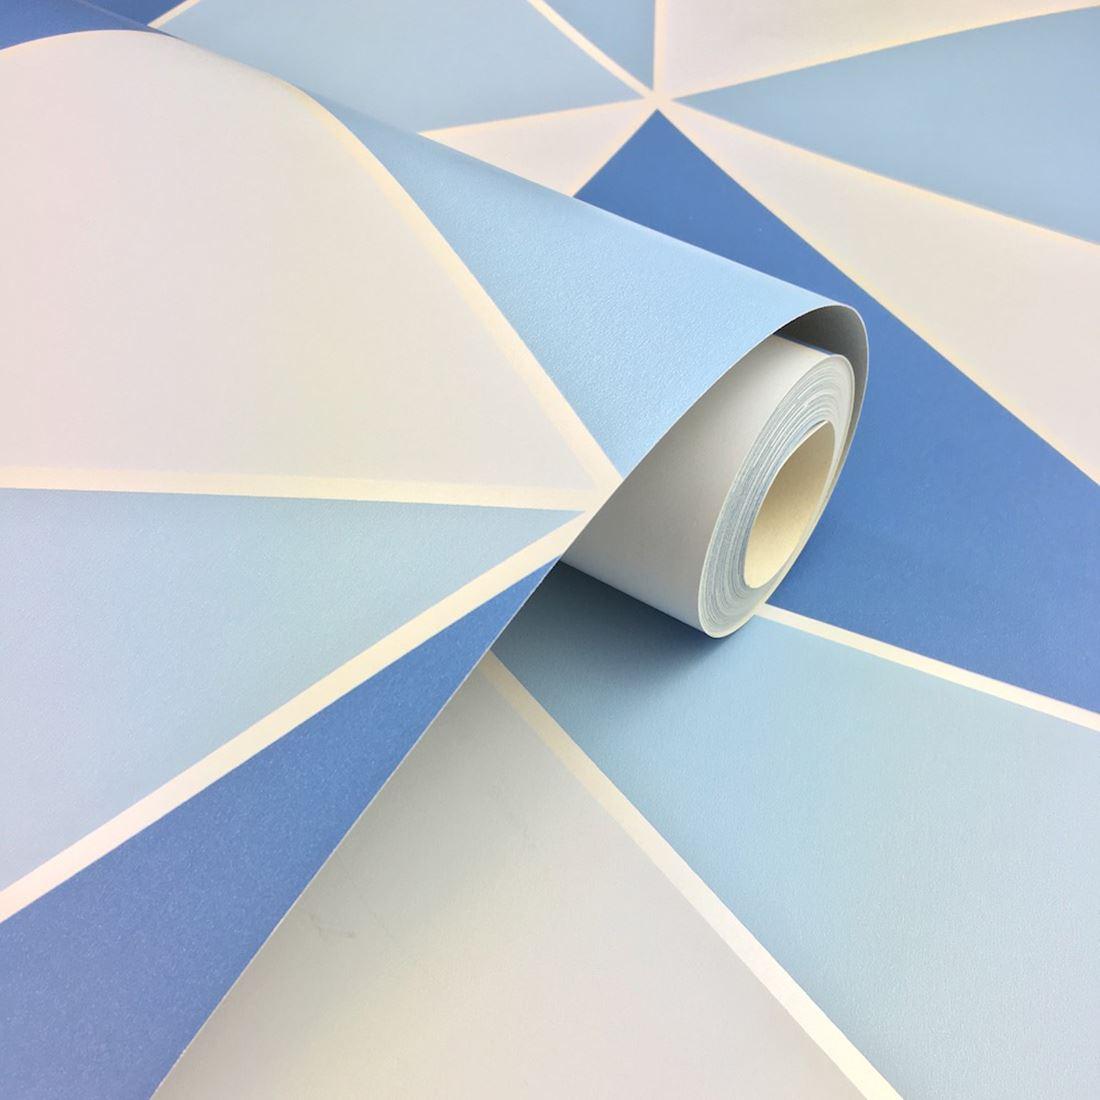 Beautiful Wallpaper Marble Blue - 029747d0-72b4-4a38-b66a-043bda6cebef  2018_35270.jpg